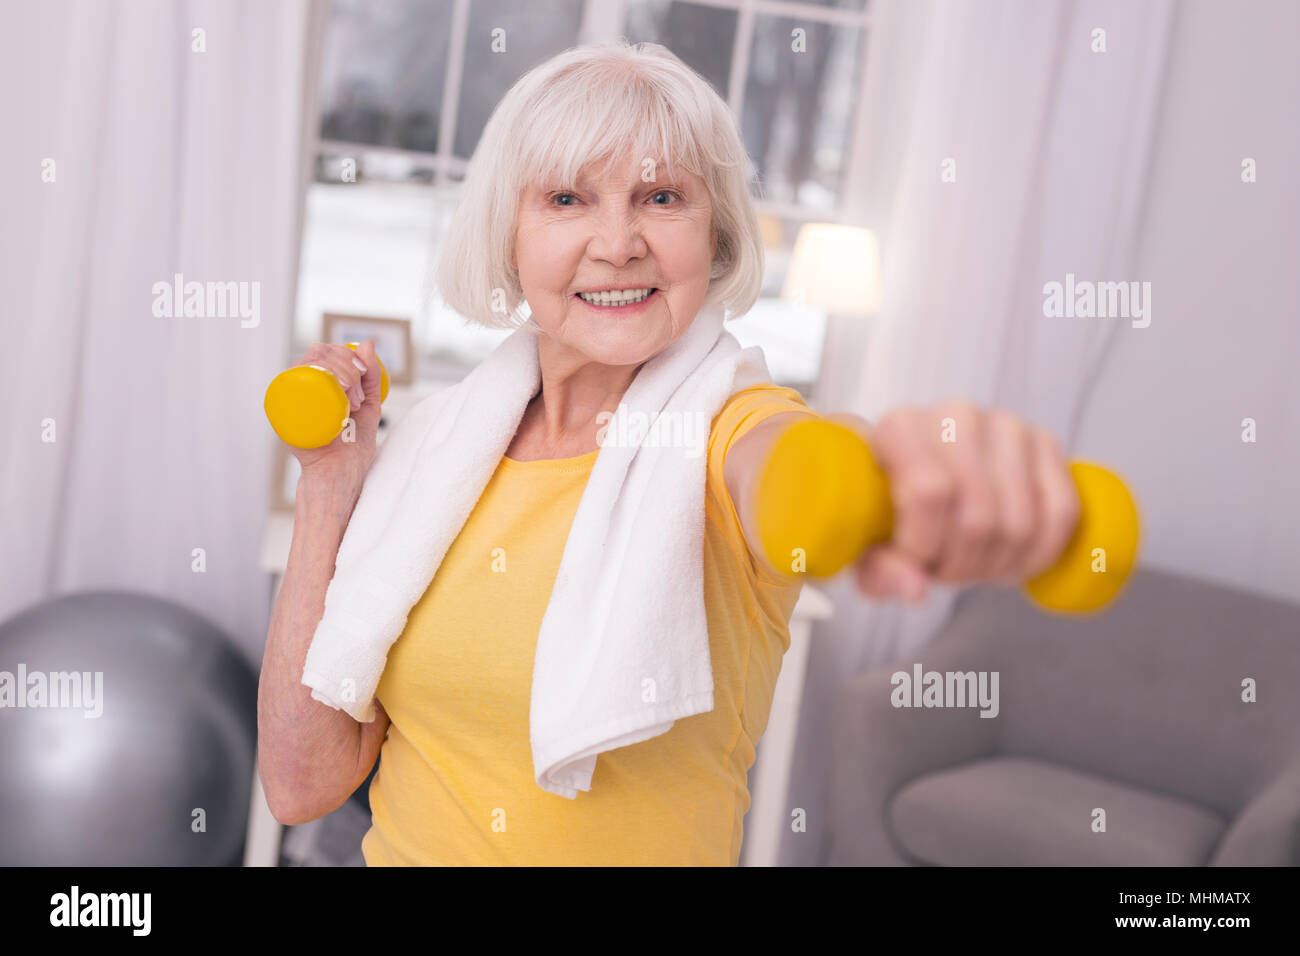 Freudige ältere Frau Training mit Kurzhanteln Stockbild